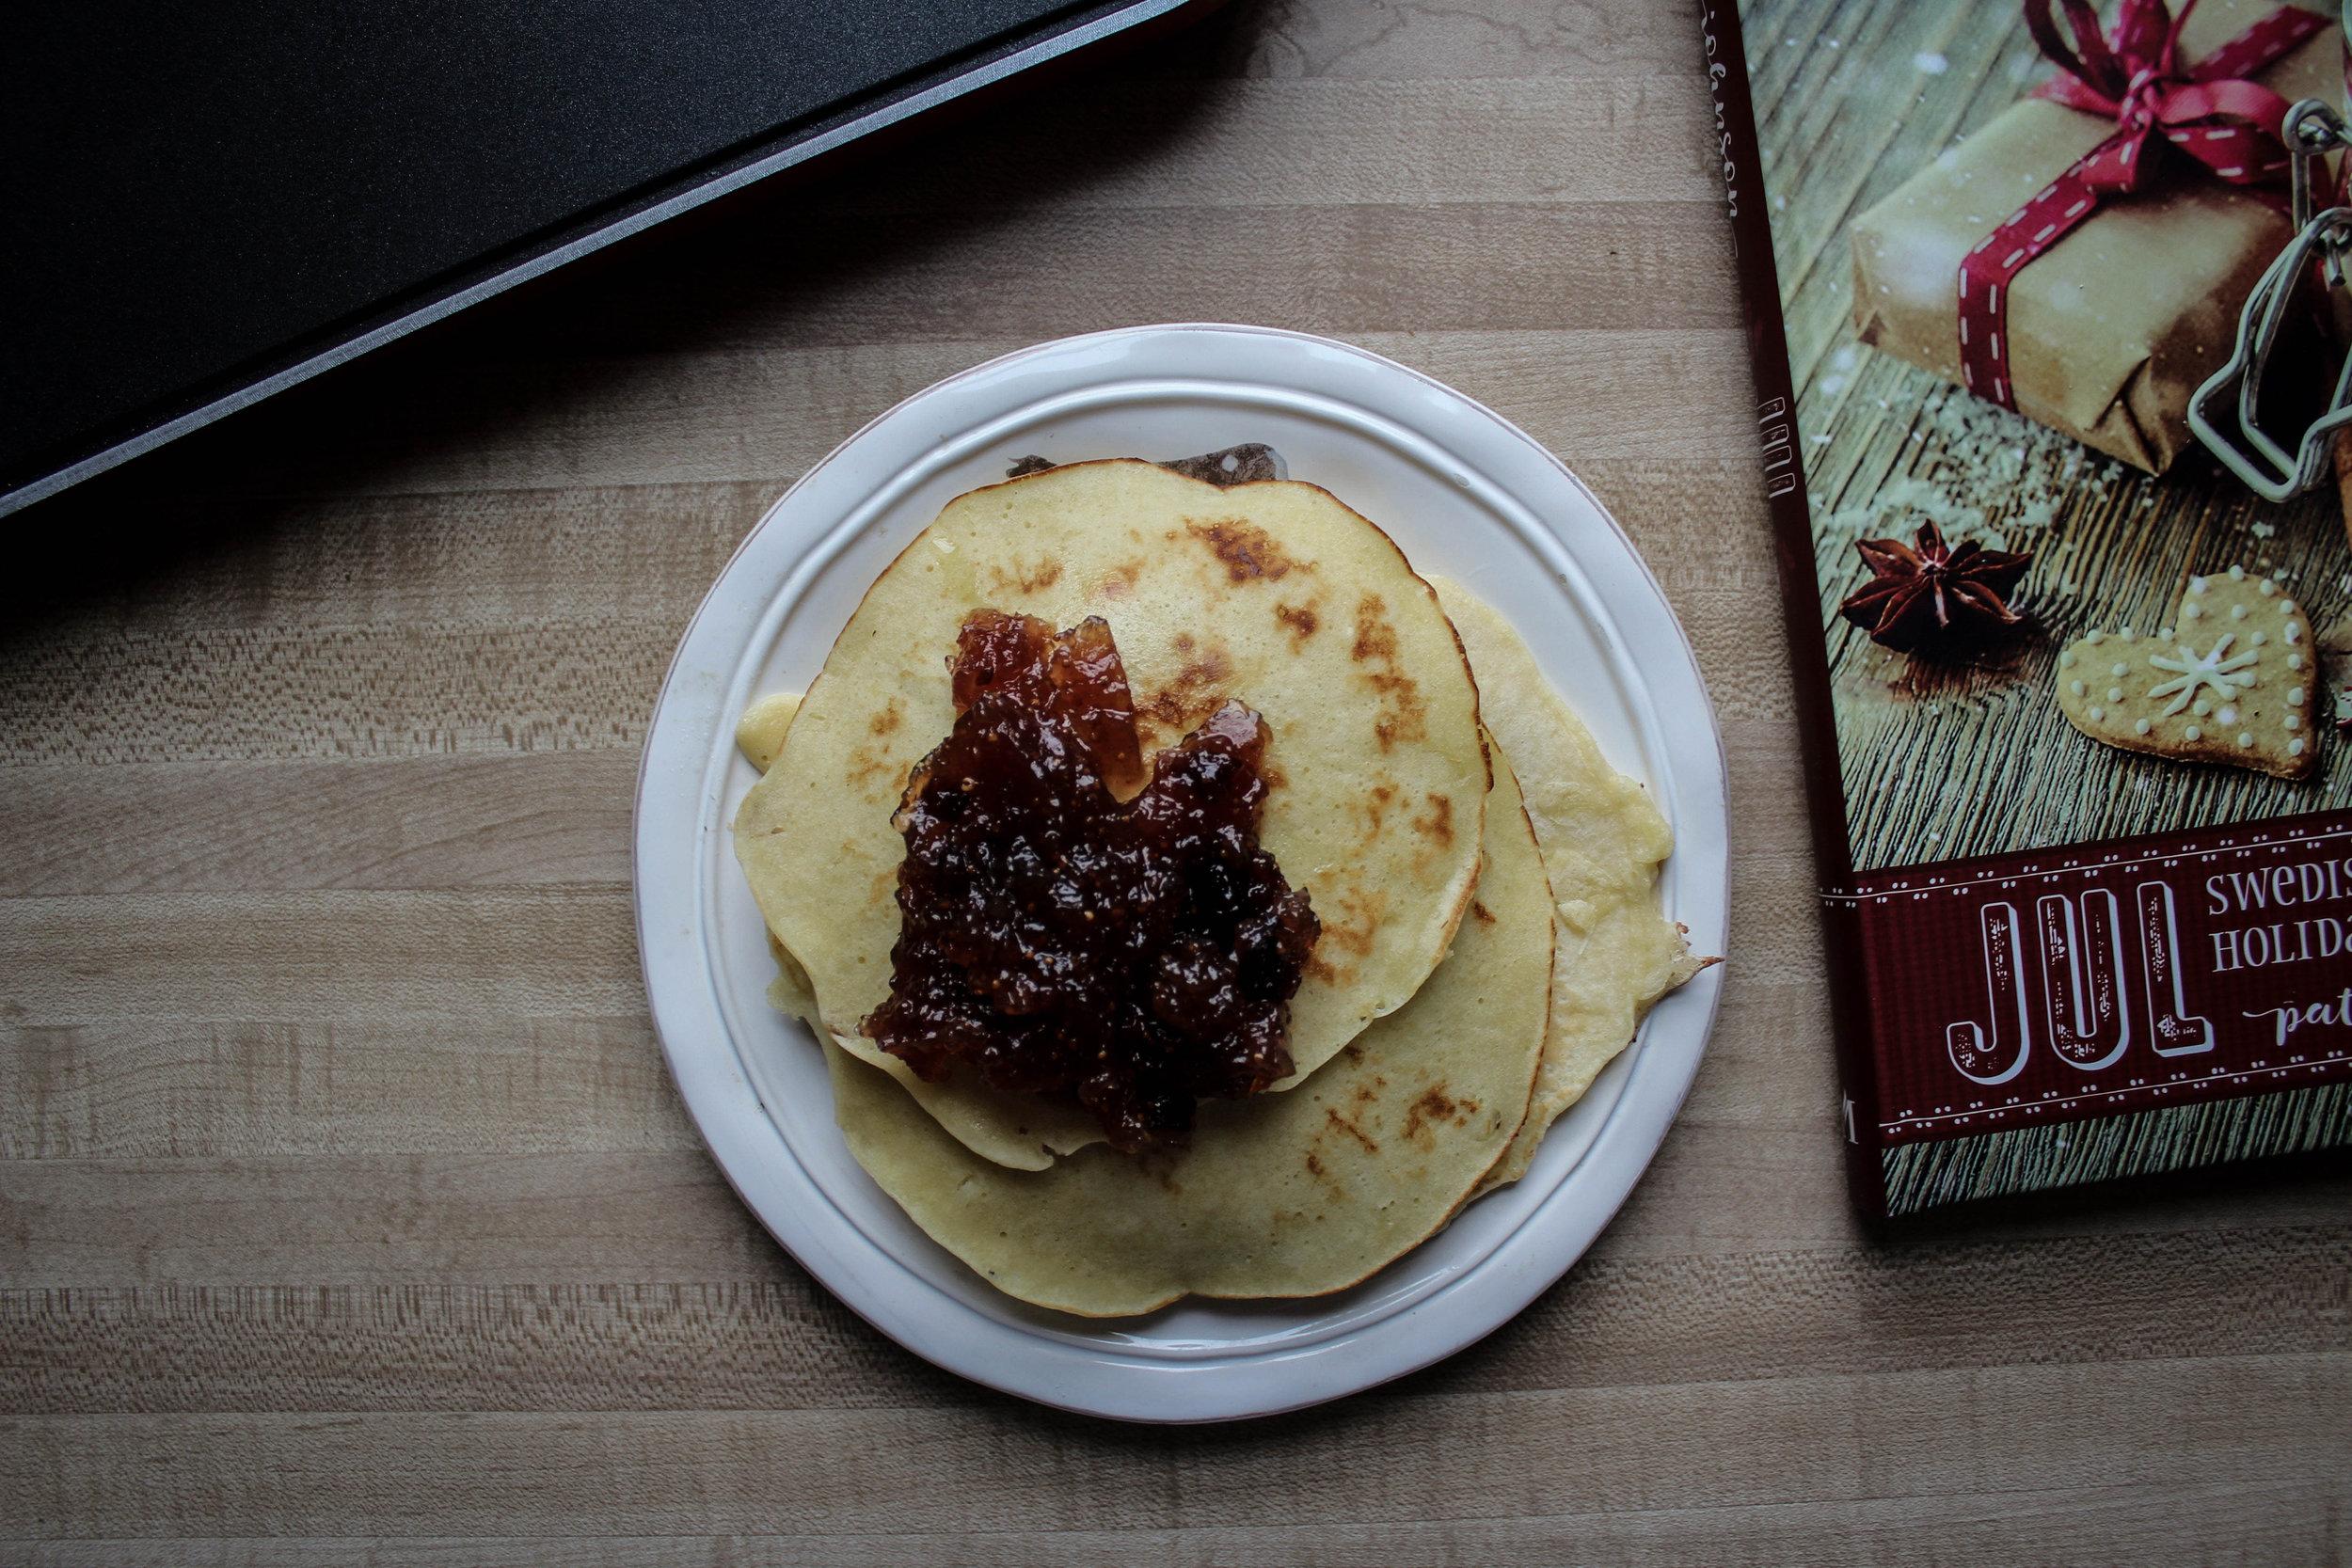 Nordic Ware - Swedish Pancakes